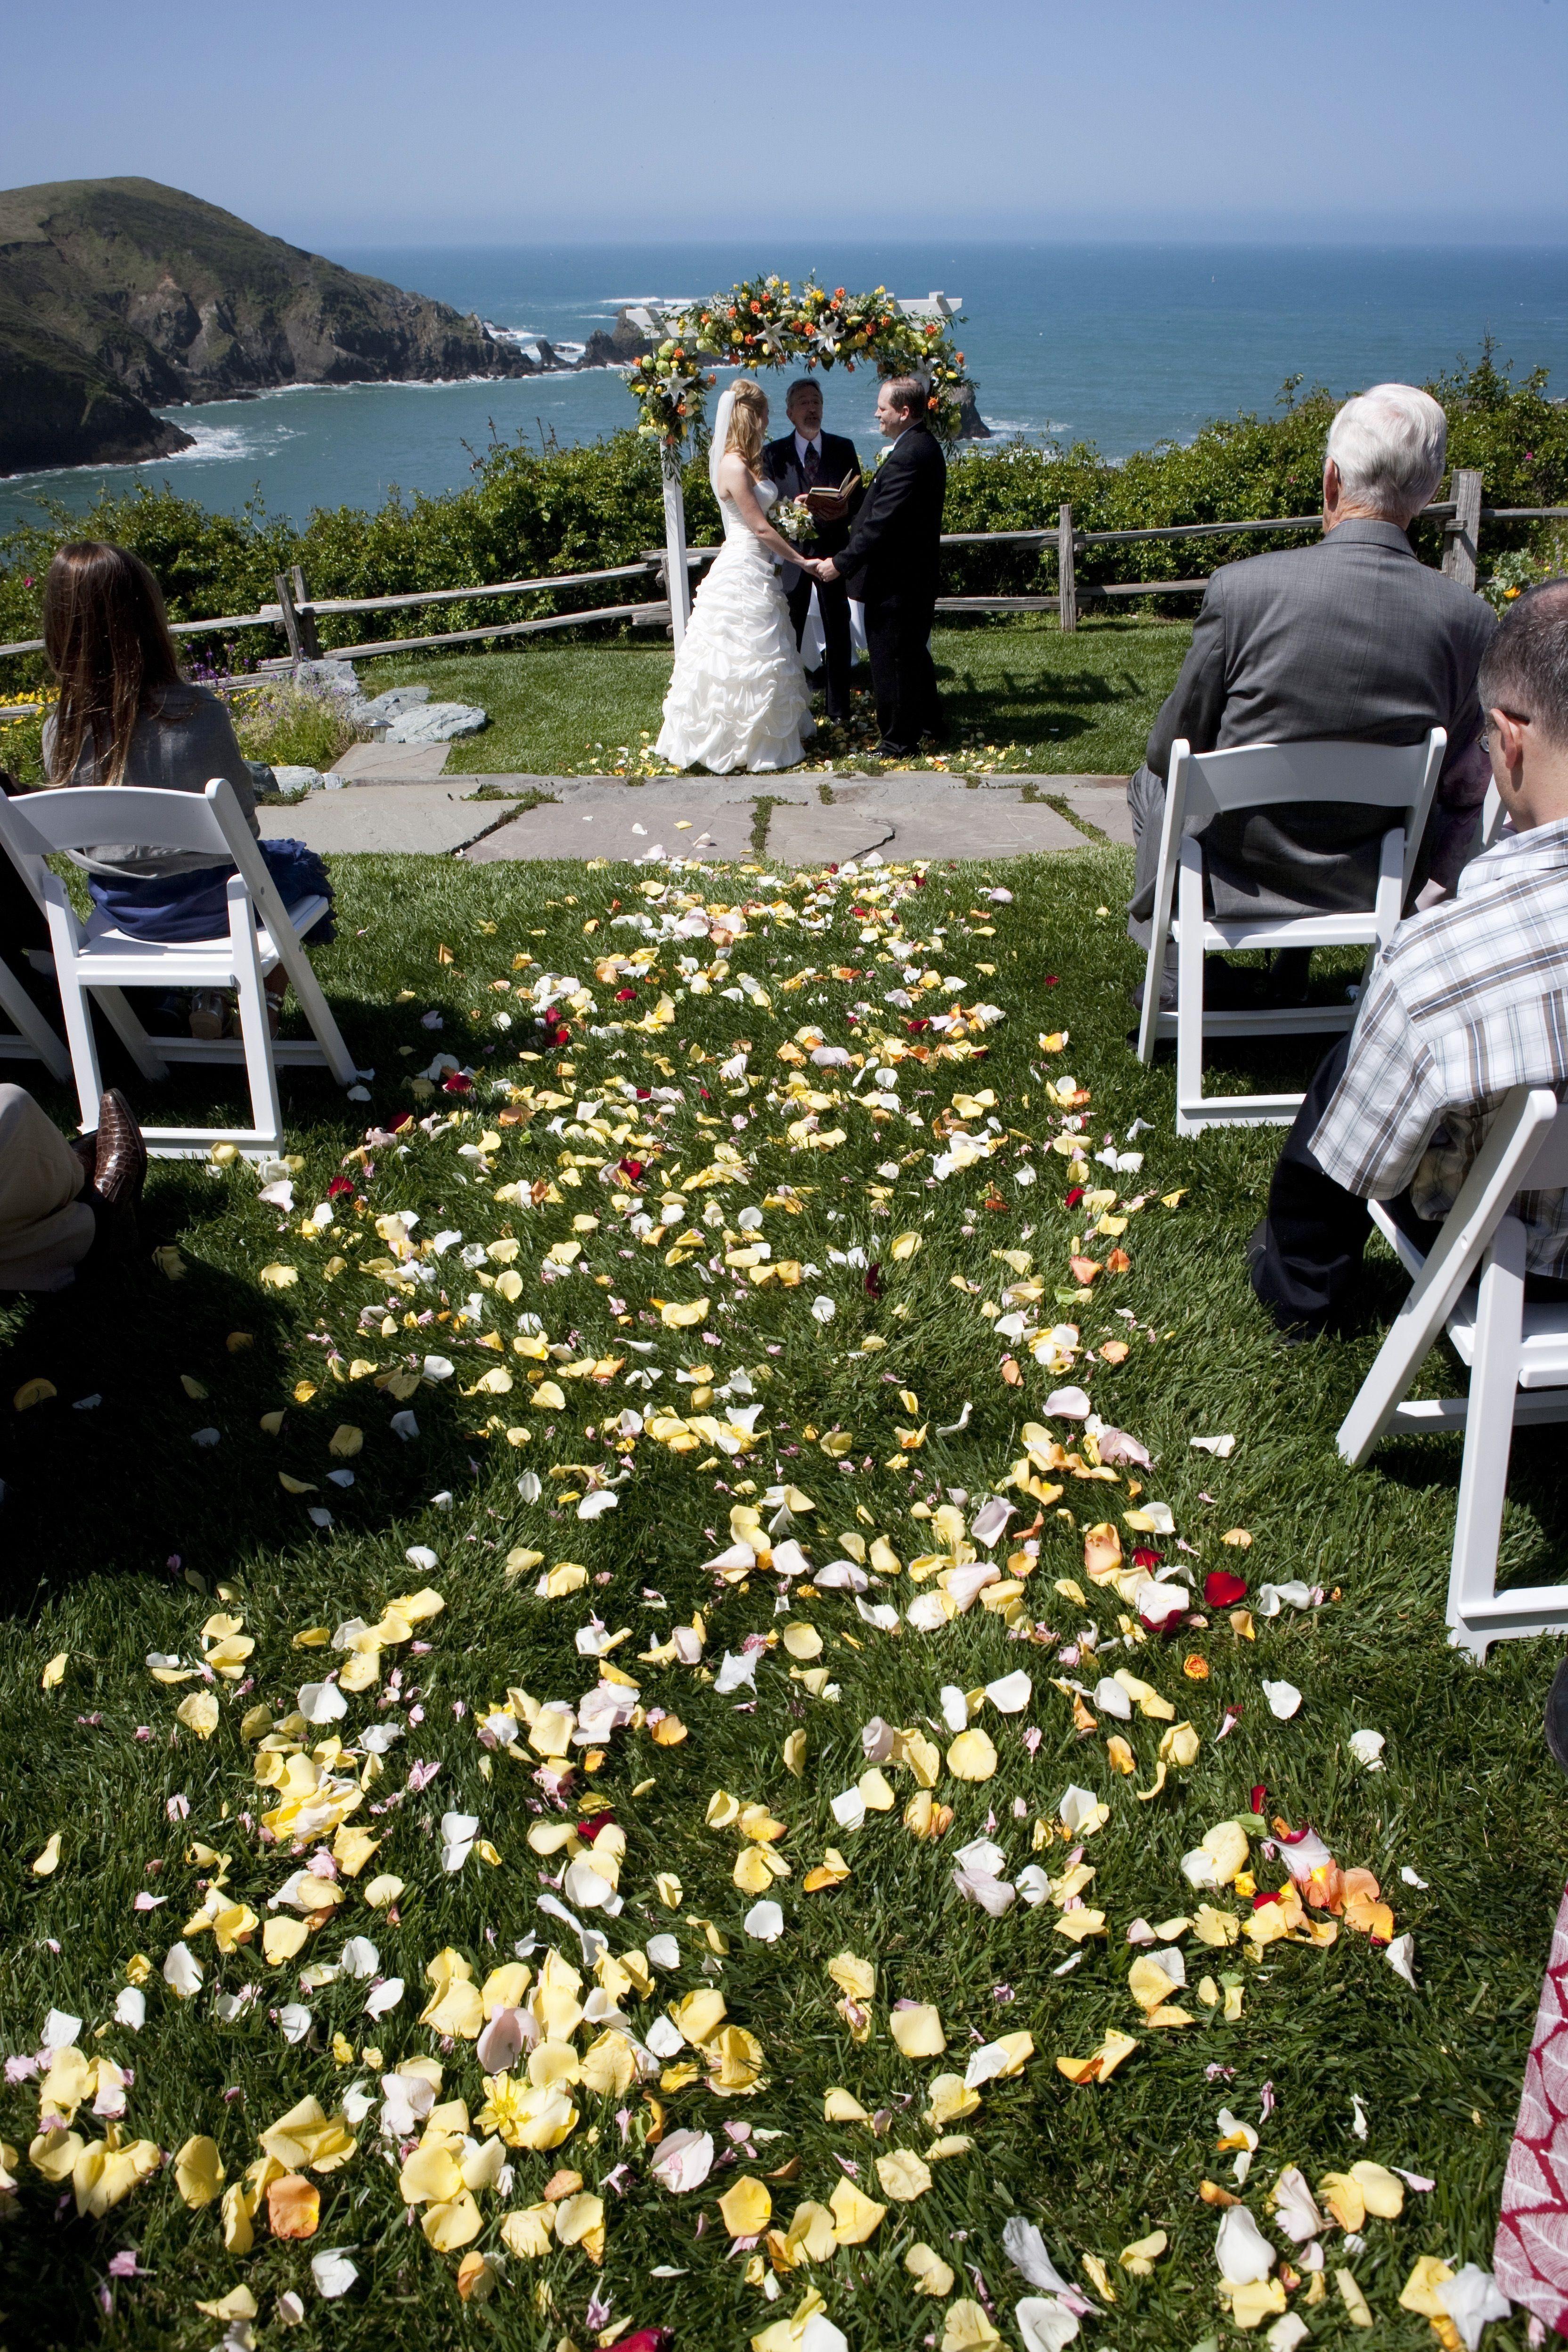 Albion River Inn Wedding In Progress Everyone Loves Petals Lrfarm Albionriverinn Rlutge Photography River Inn Wedding Venues Wedding